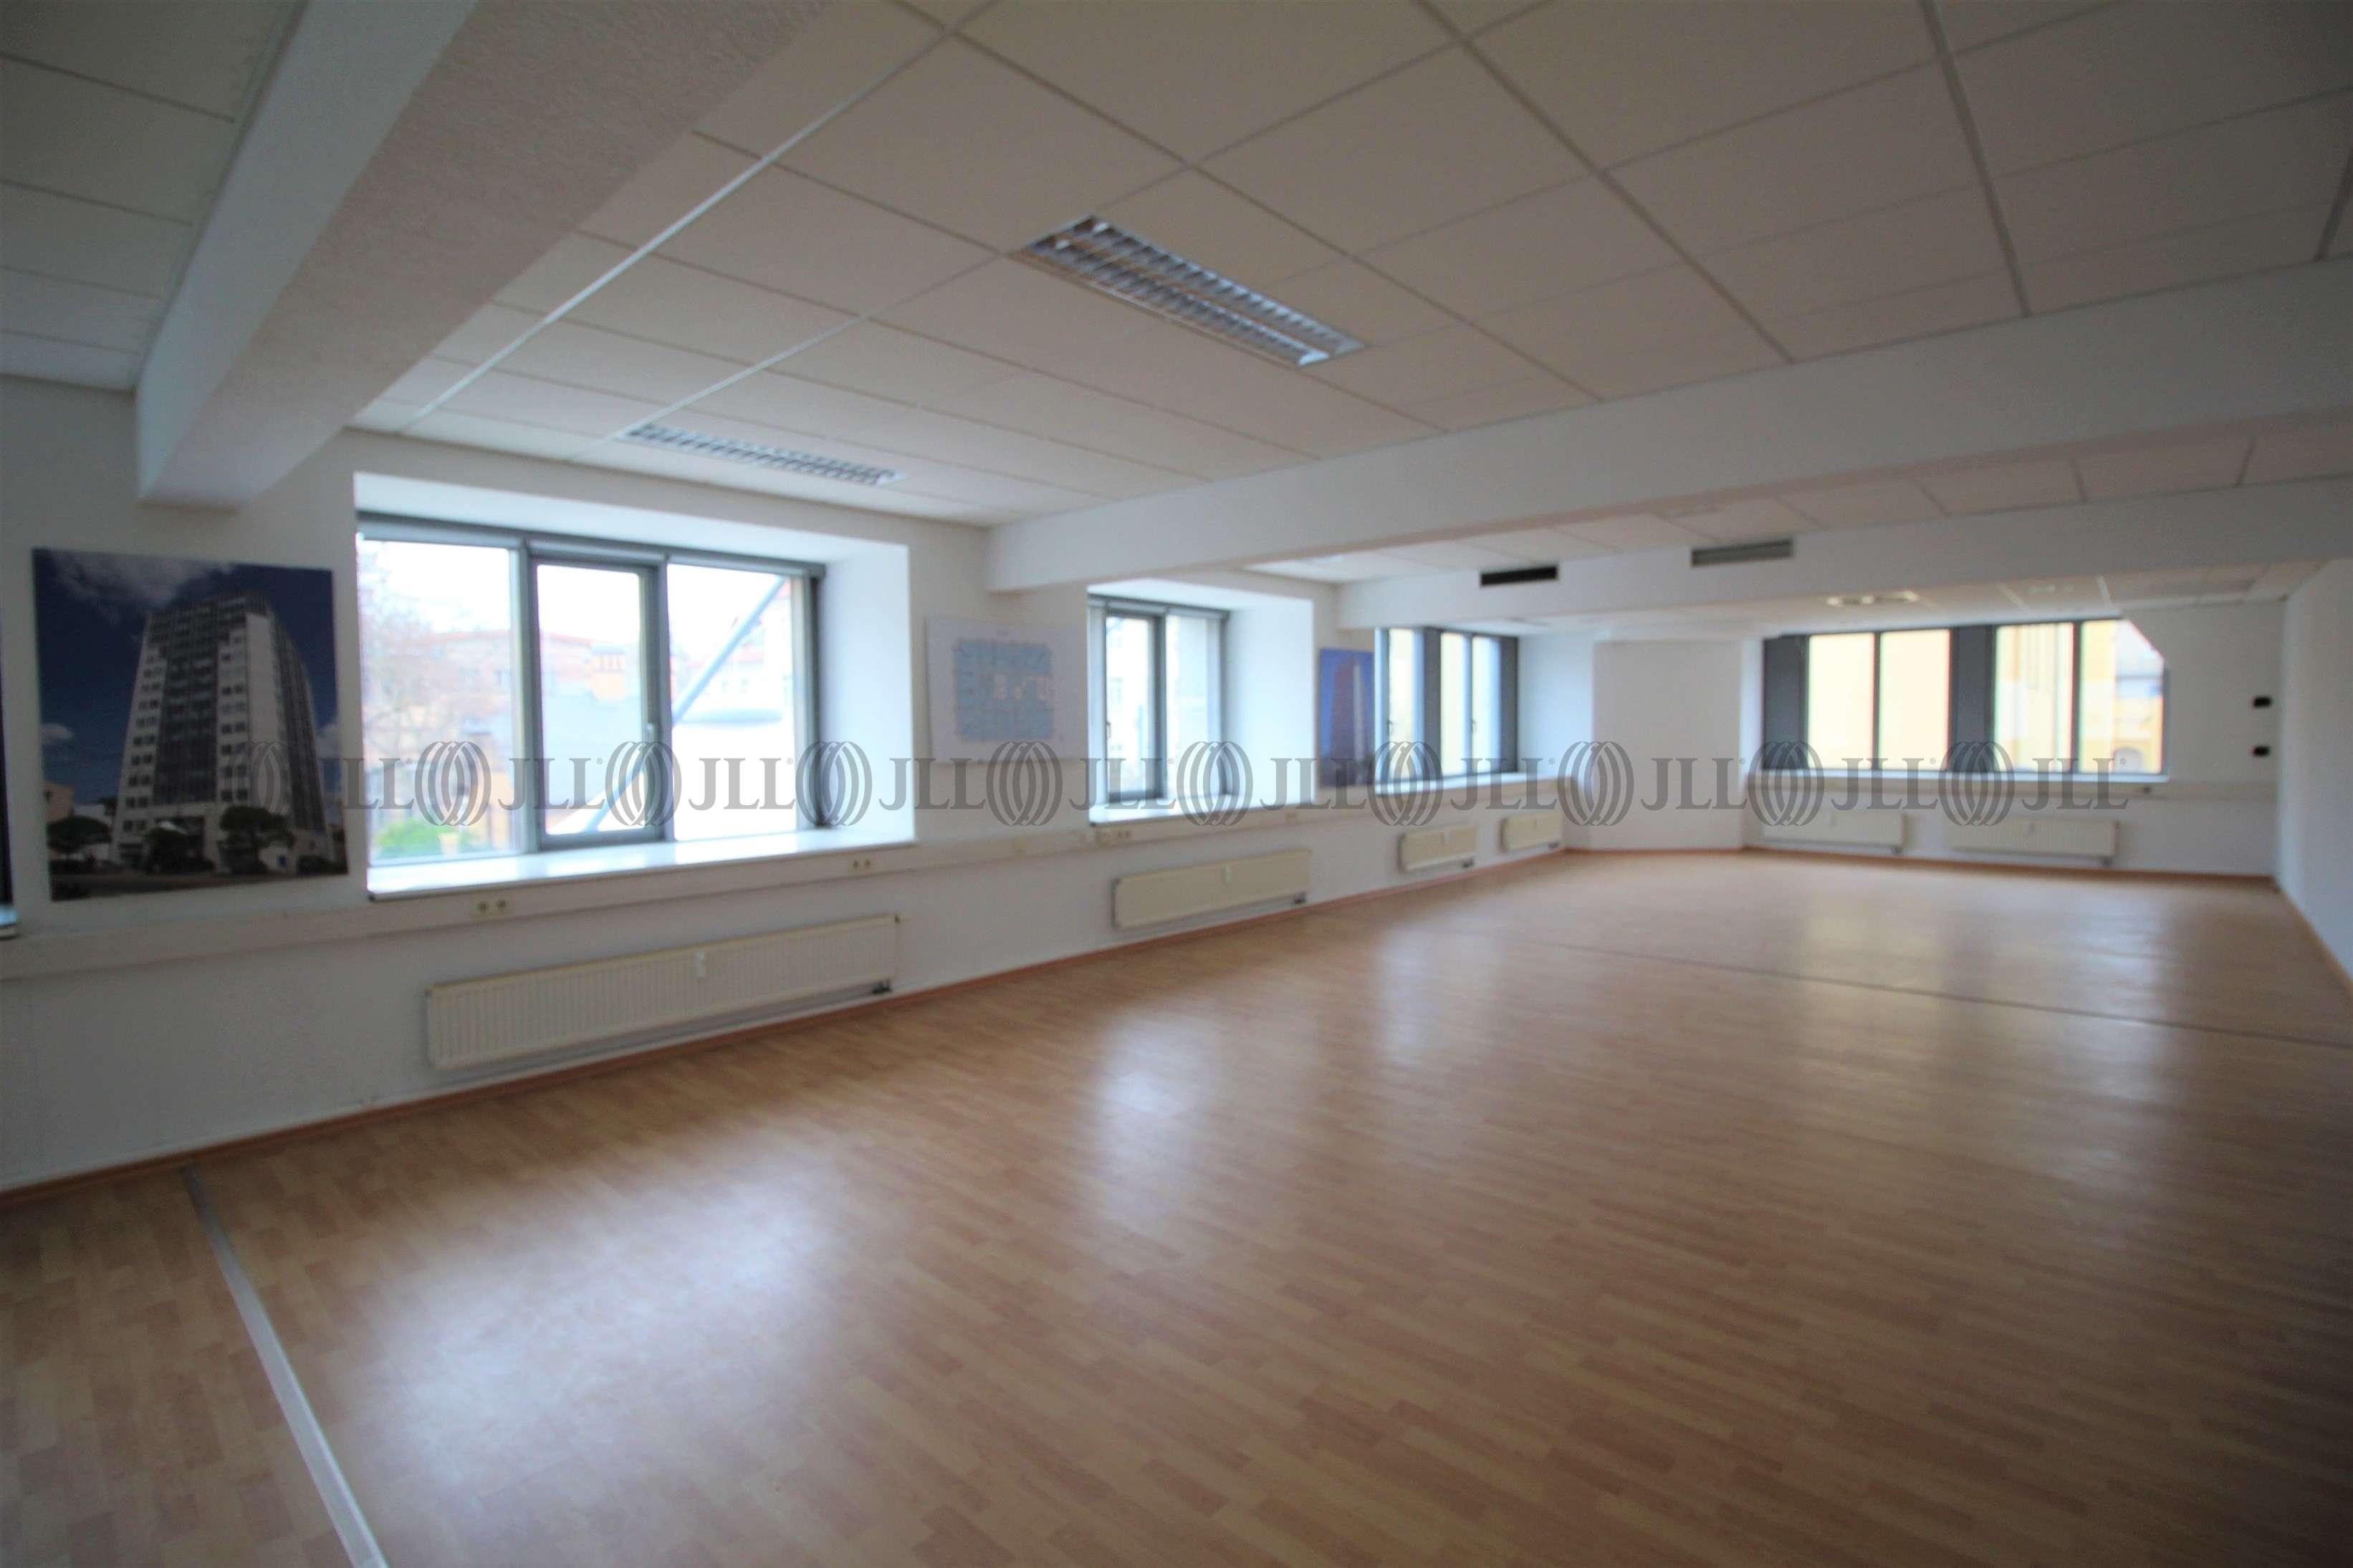 Büros Halle (saale), 06112 - Büro - Halle (Saale), Innenstadt - B1699 - 10080736